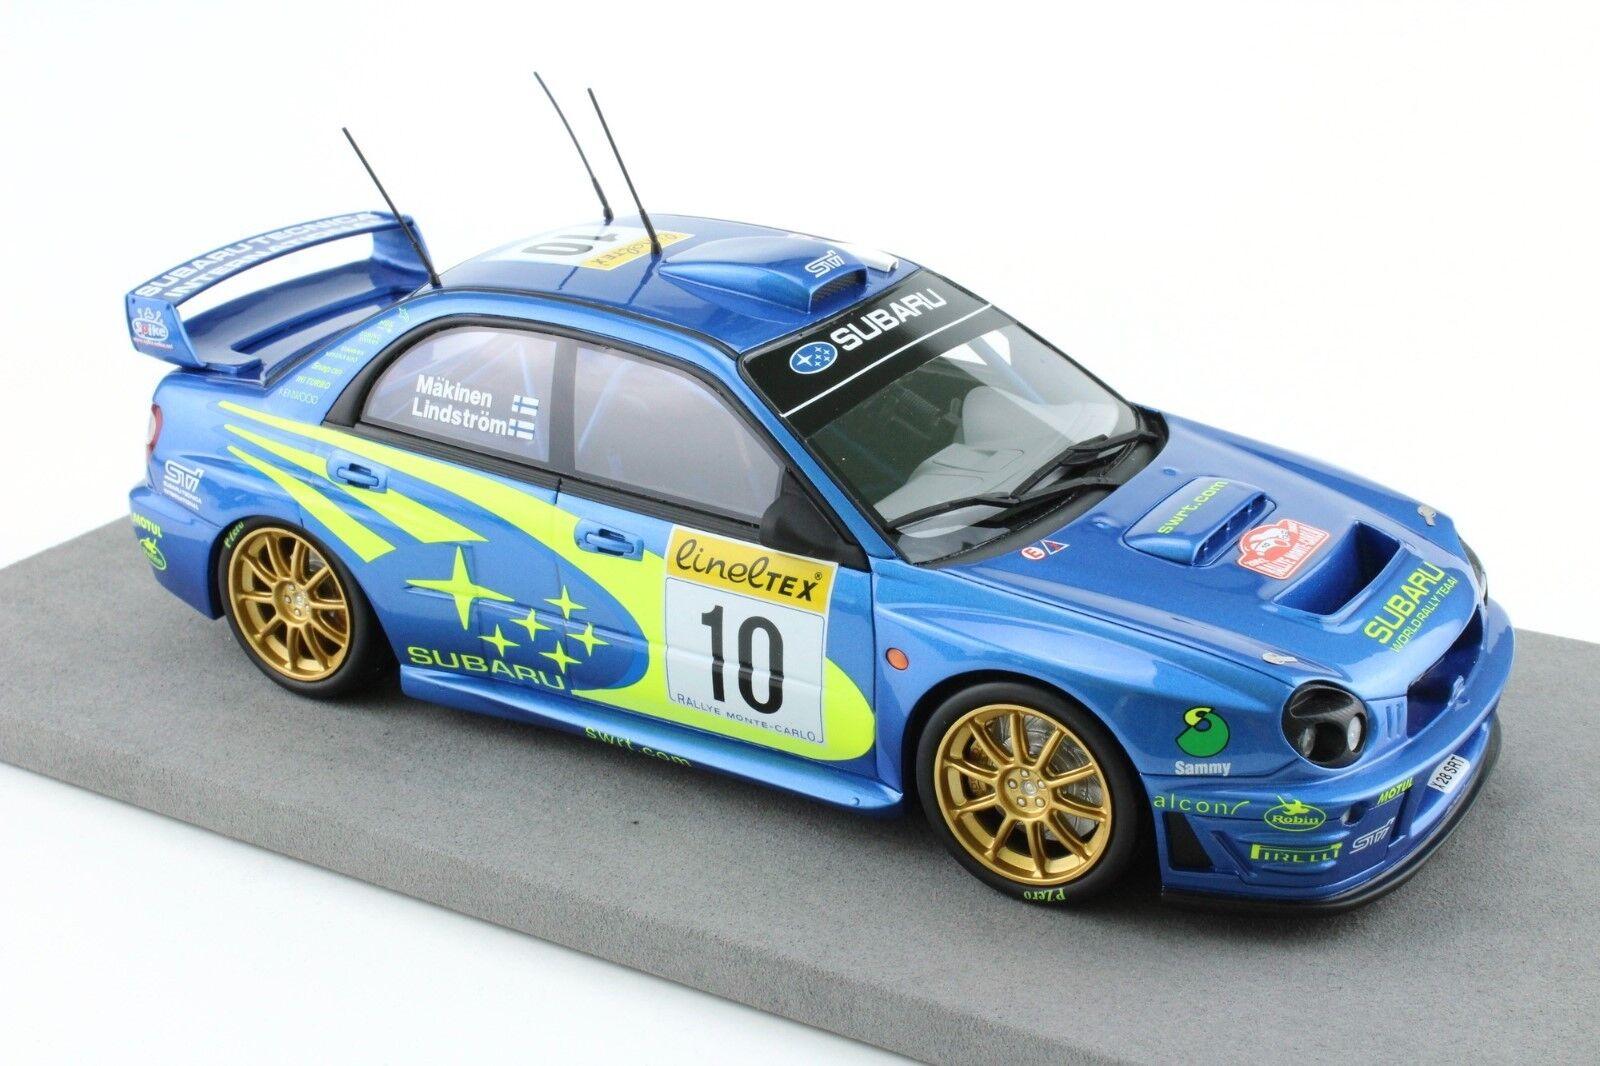 Subaru Subaru Subaru Impreza WRC s7 MONTE CARLO 2002  10 Mäkinen Winner victoire Top Marques 1 18 4e619f